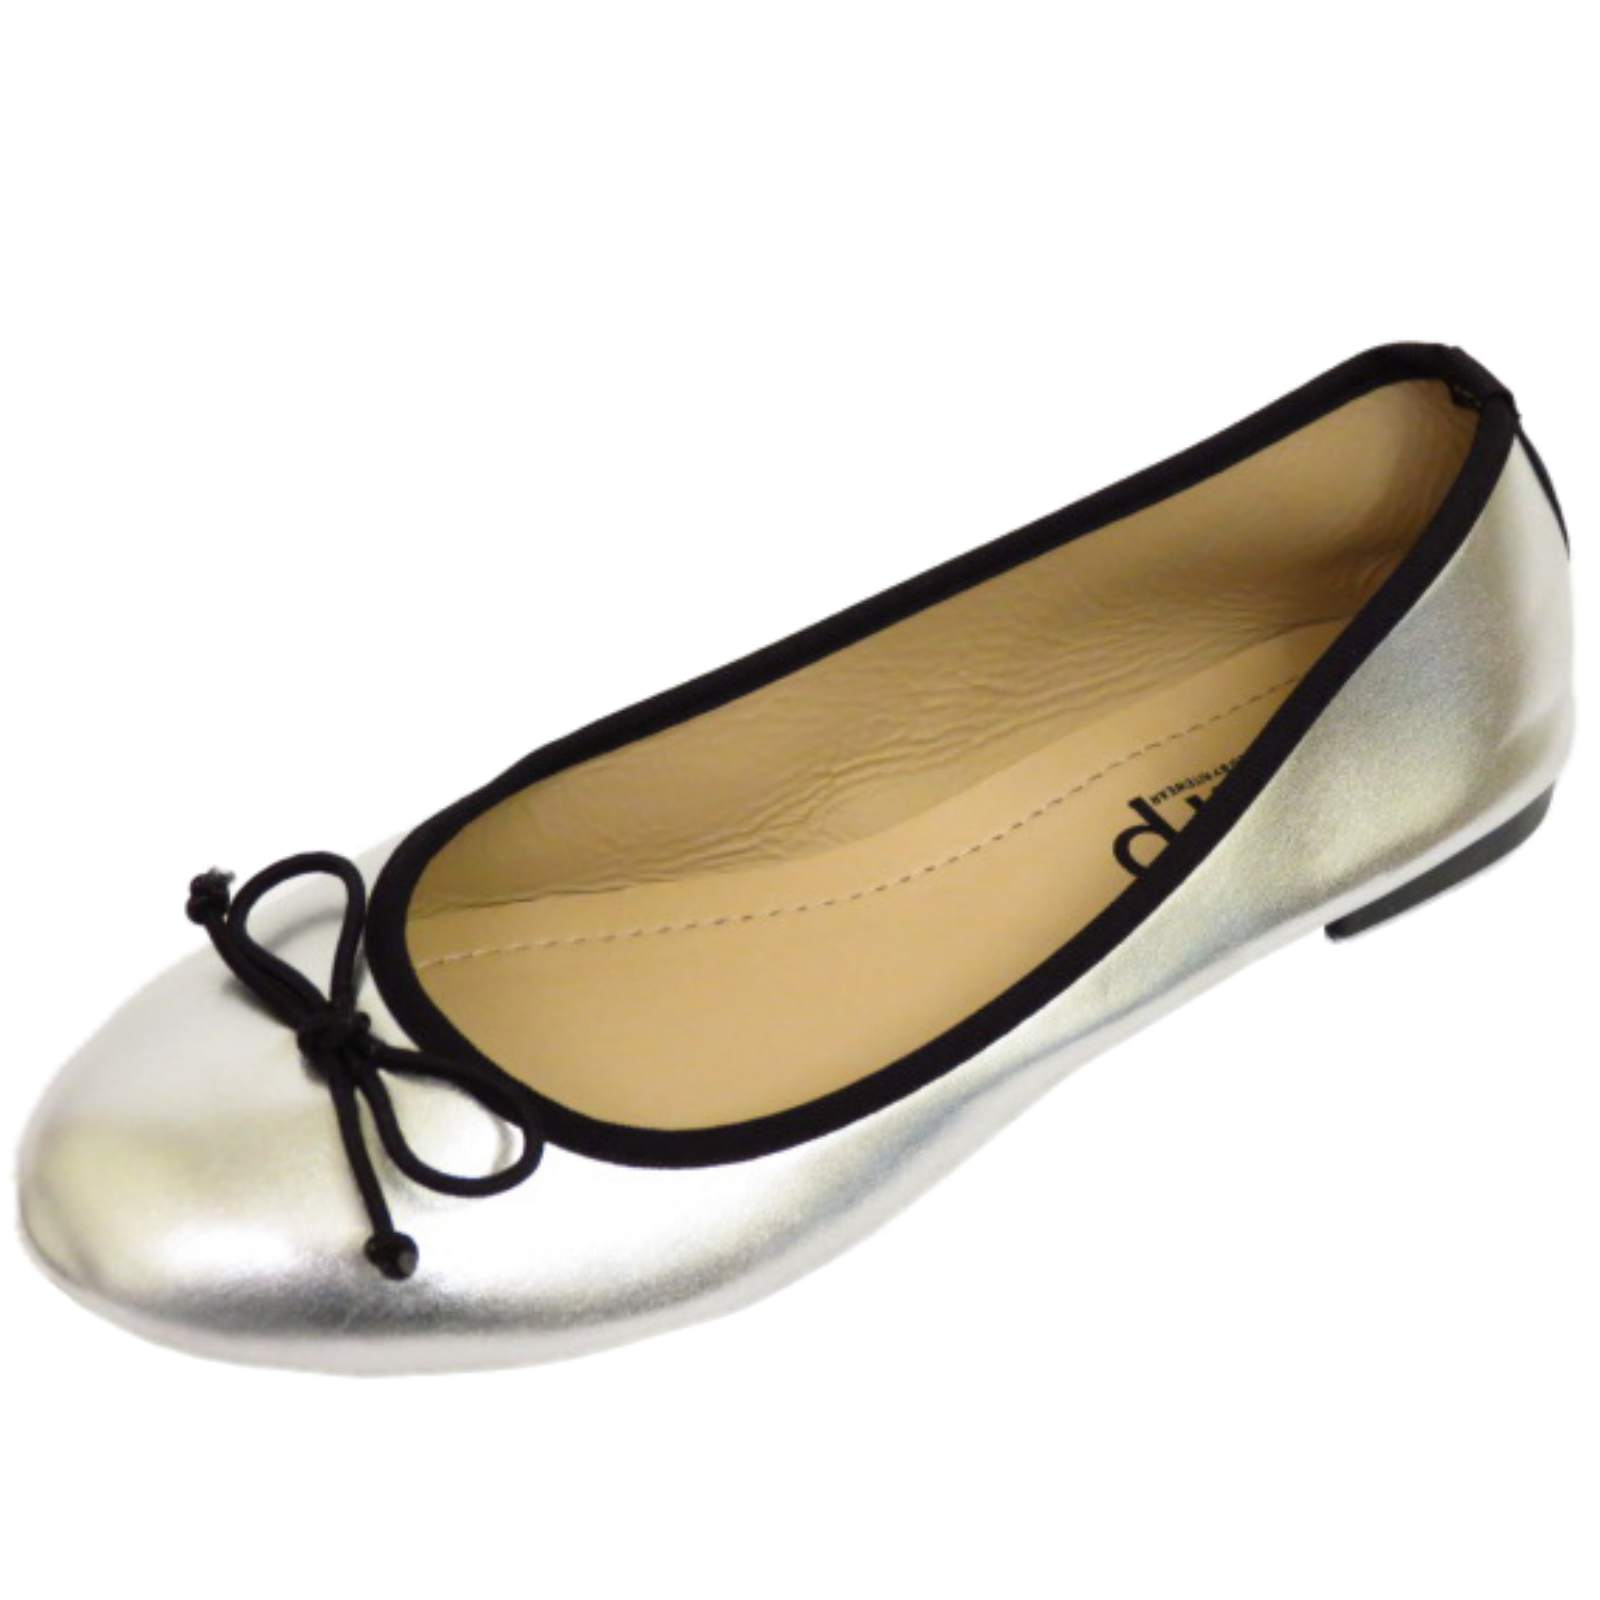 Mink Flat Shoes